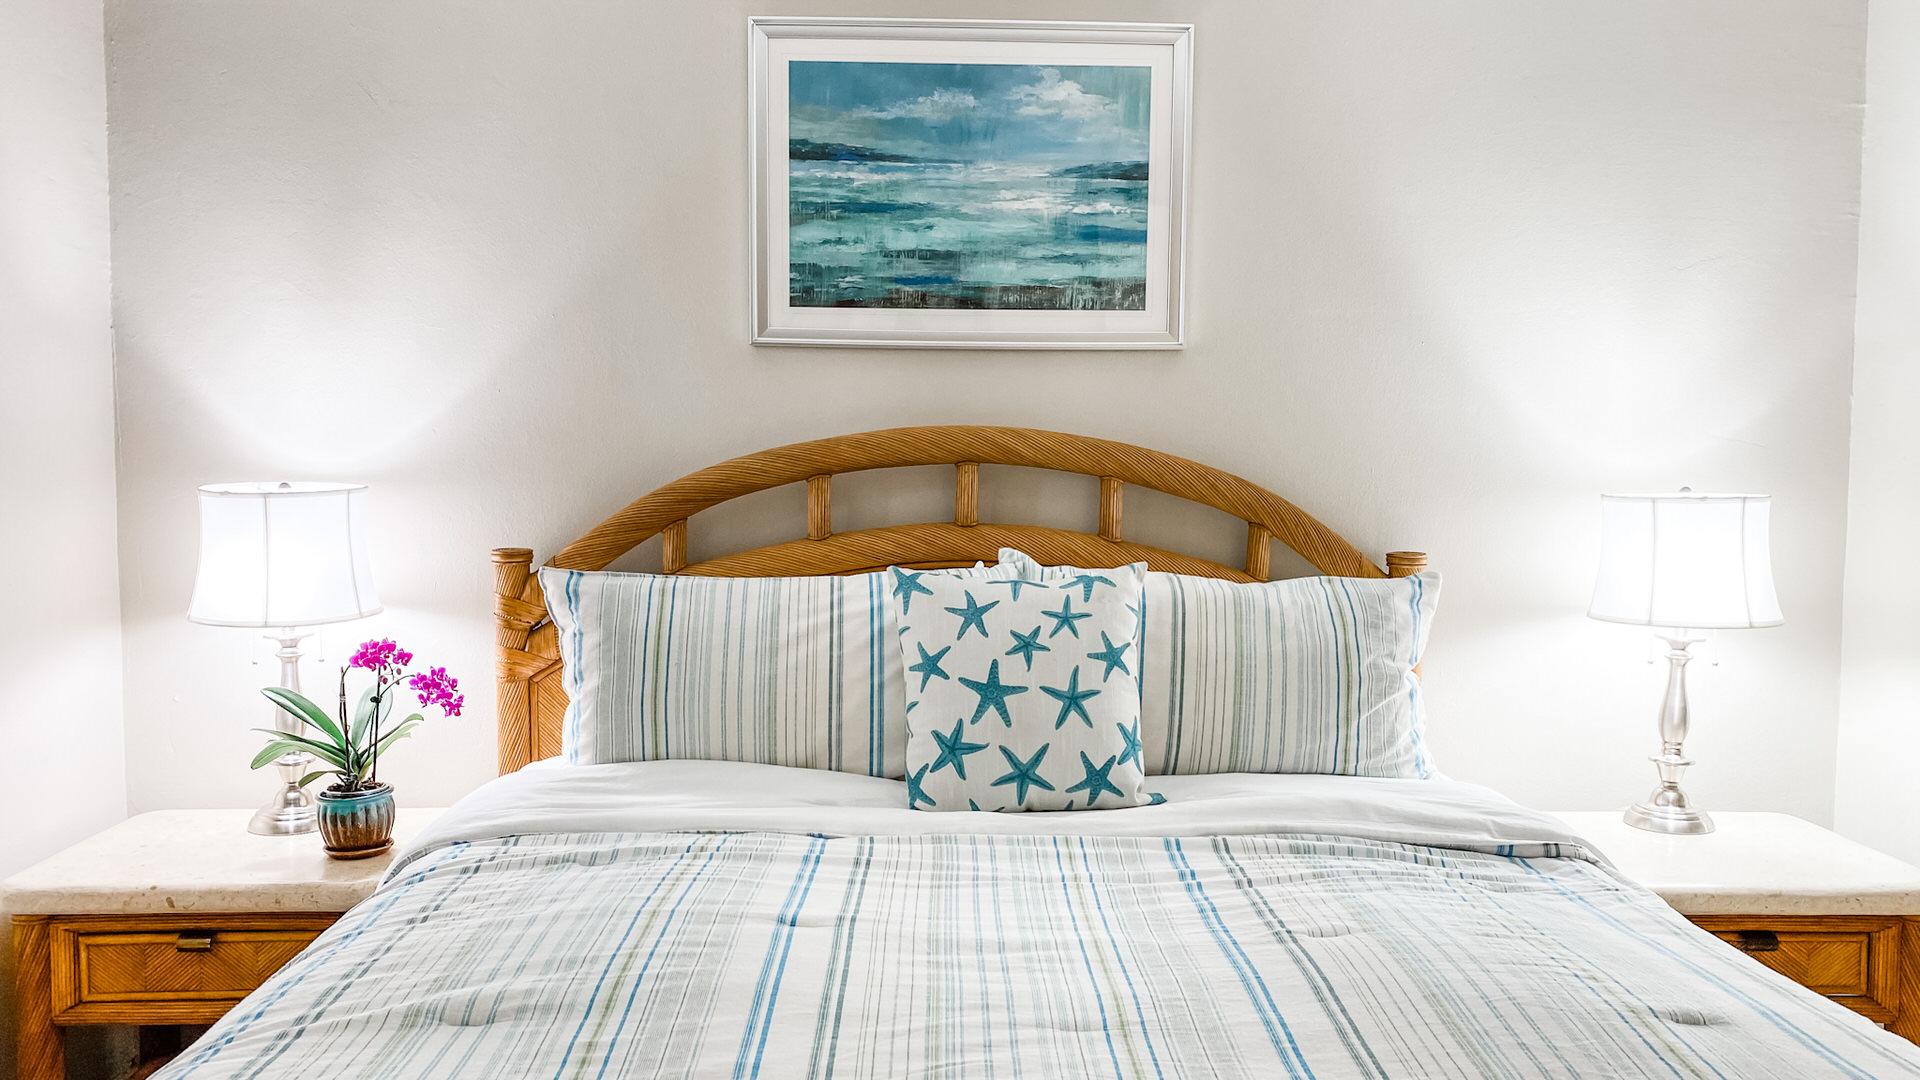 B103 Master Bedroom King Size Bed